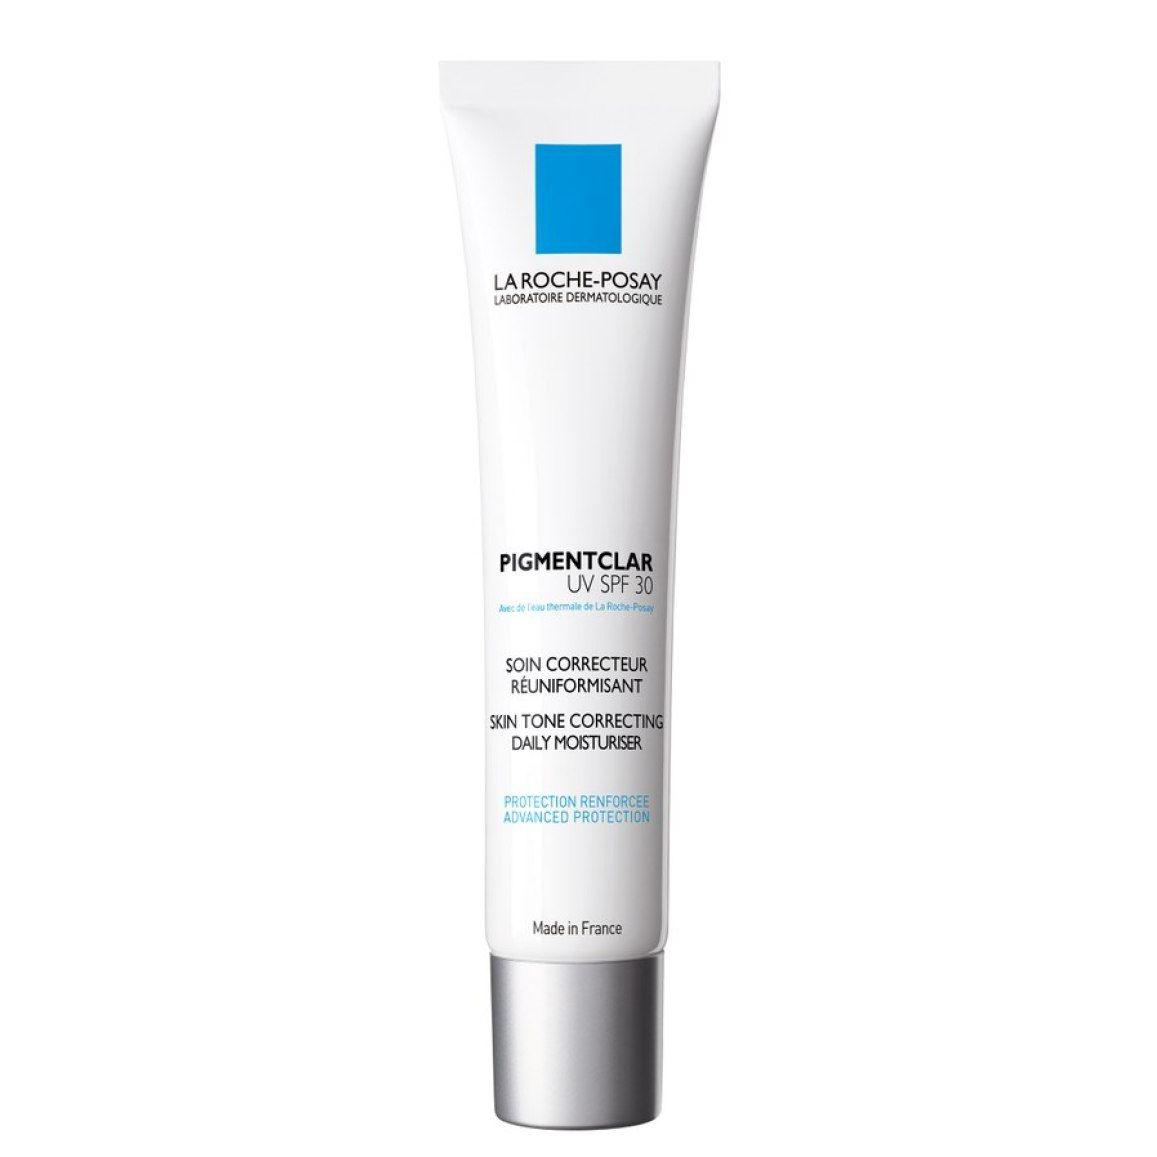 La Roche Posay Pigmentclar UV